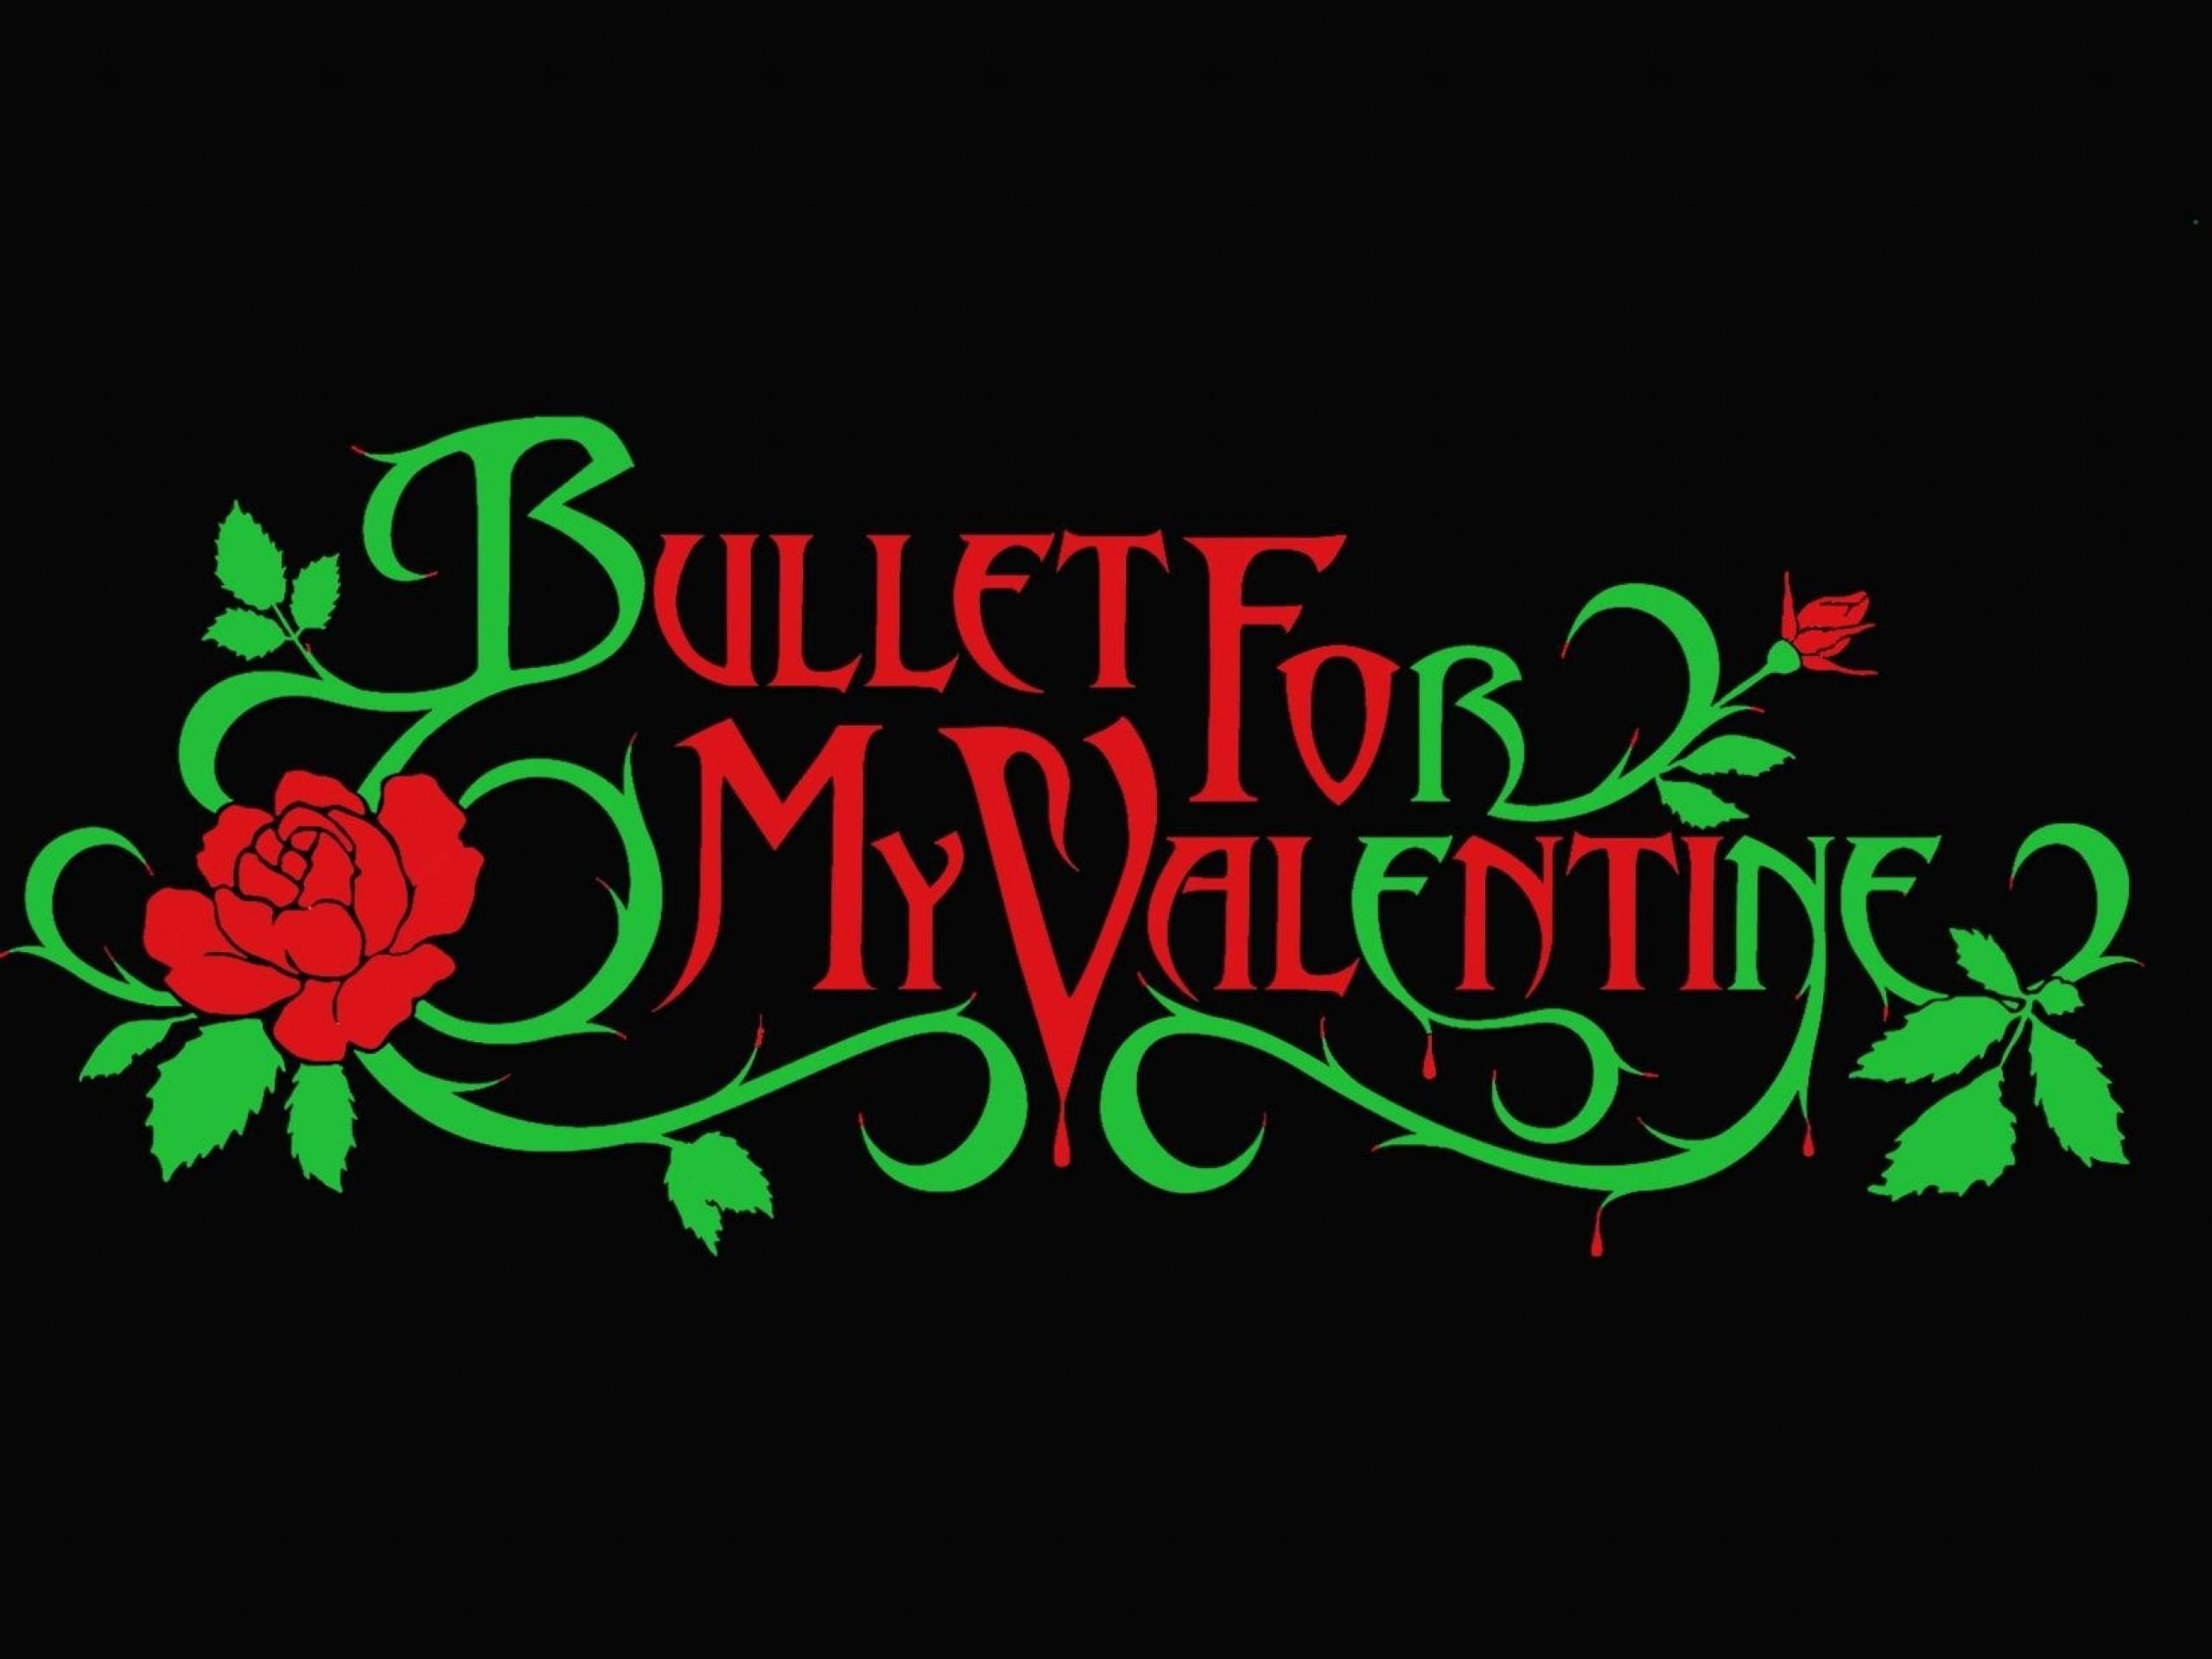 Bullet For My Valentine Wallpaper 67 Images